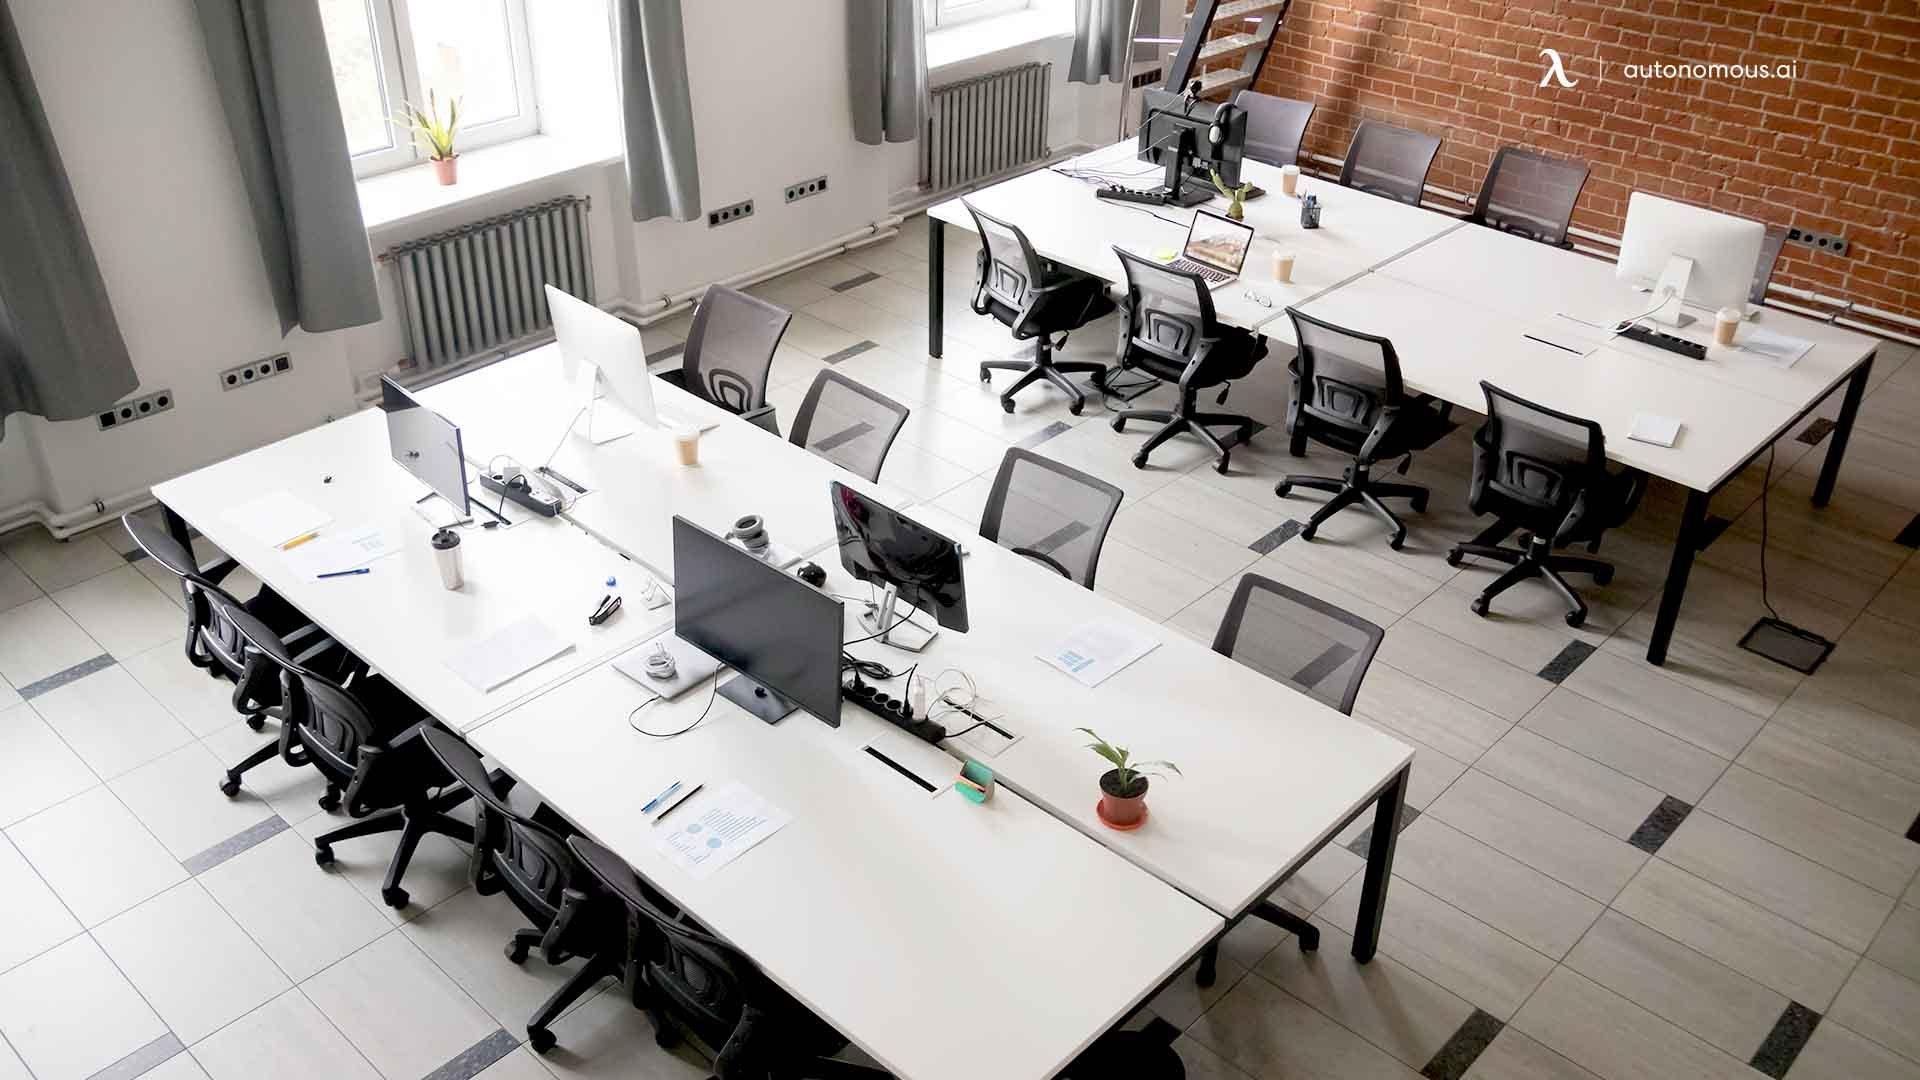 Define Hybrid Working and Hybrid Office